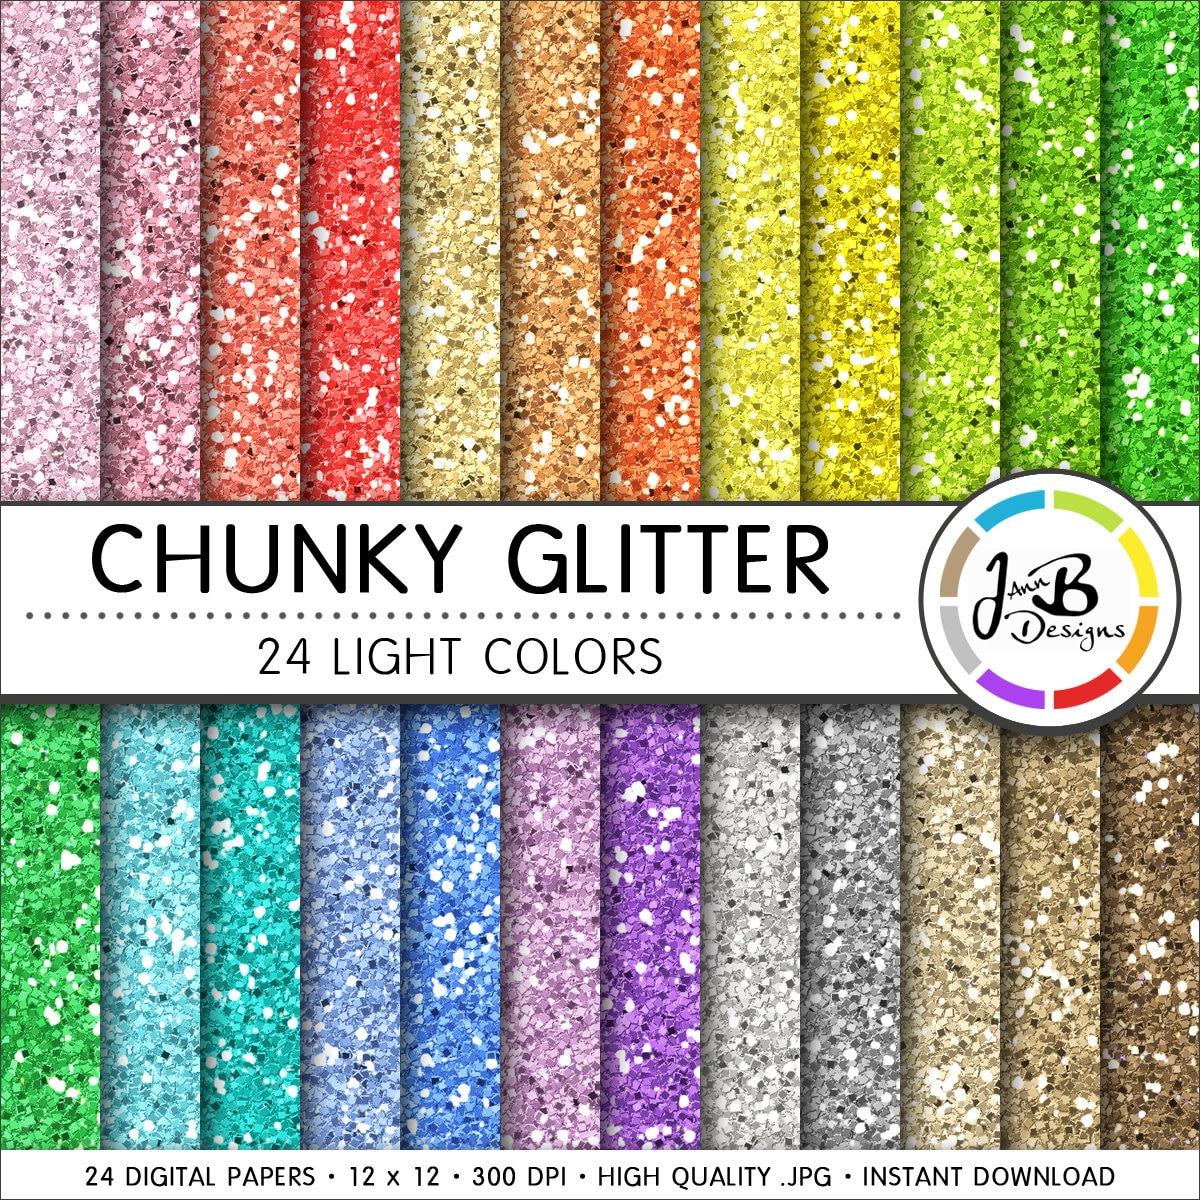 How to scrapbook with glitter - Glitter Digital Paper Glitter Paper Scrapbook Paper Chunky Glitter Glitter Glitter Texture Glitter Digital Glitter Background Light